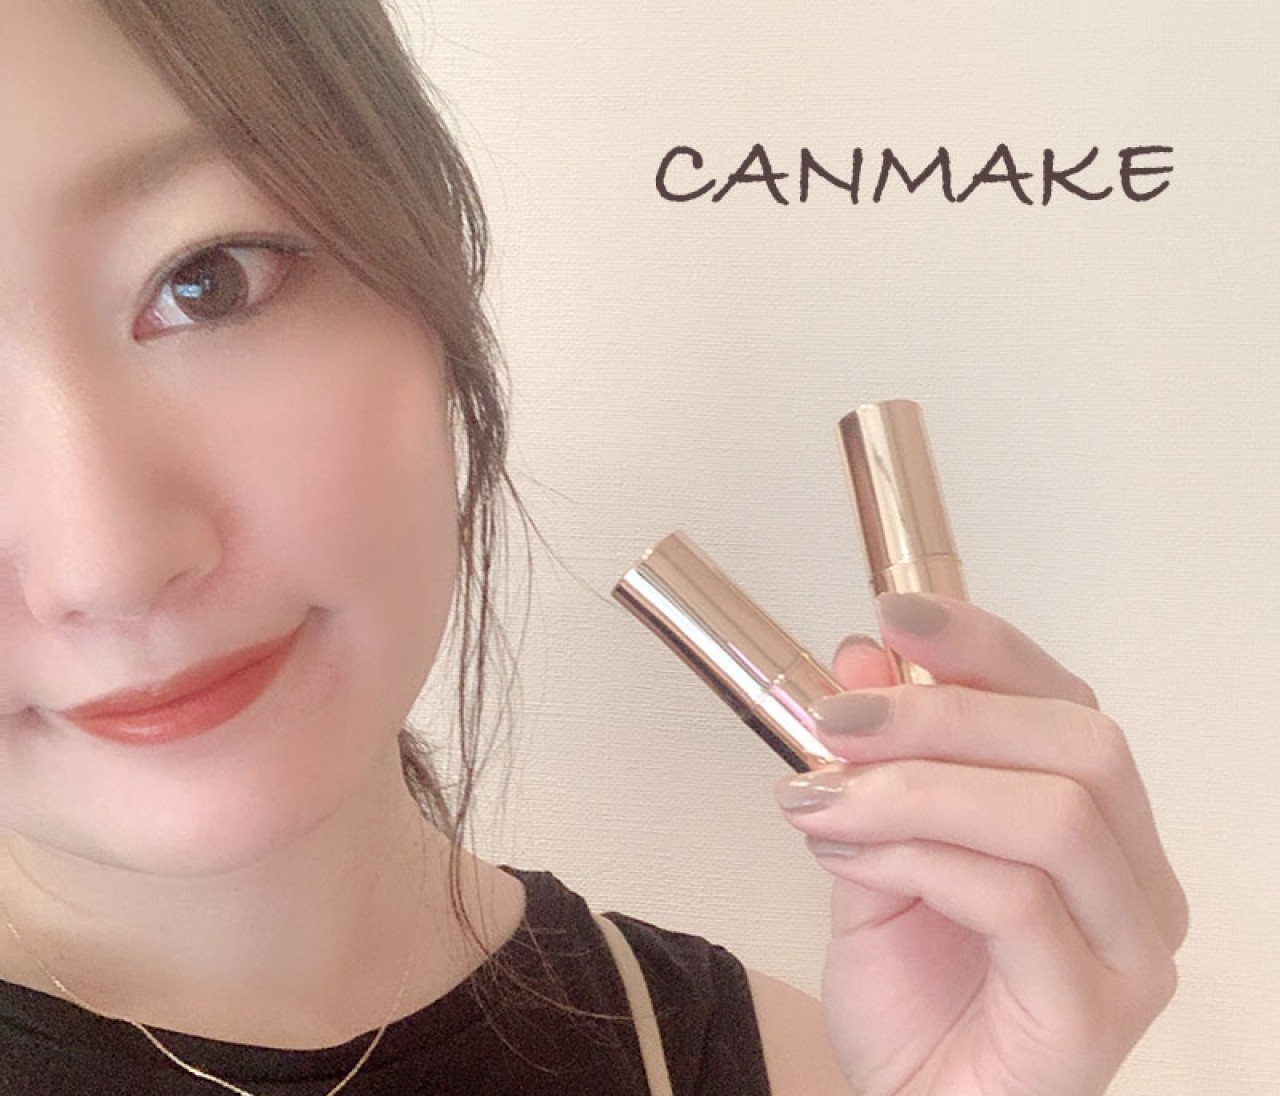 【CANMAKE】優秀で可愛い!プチプラリップ♡